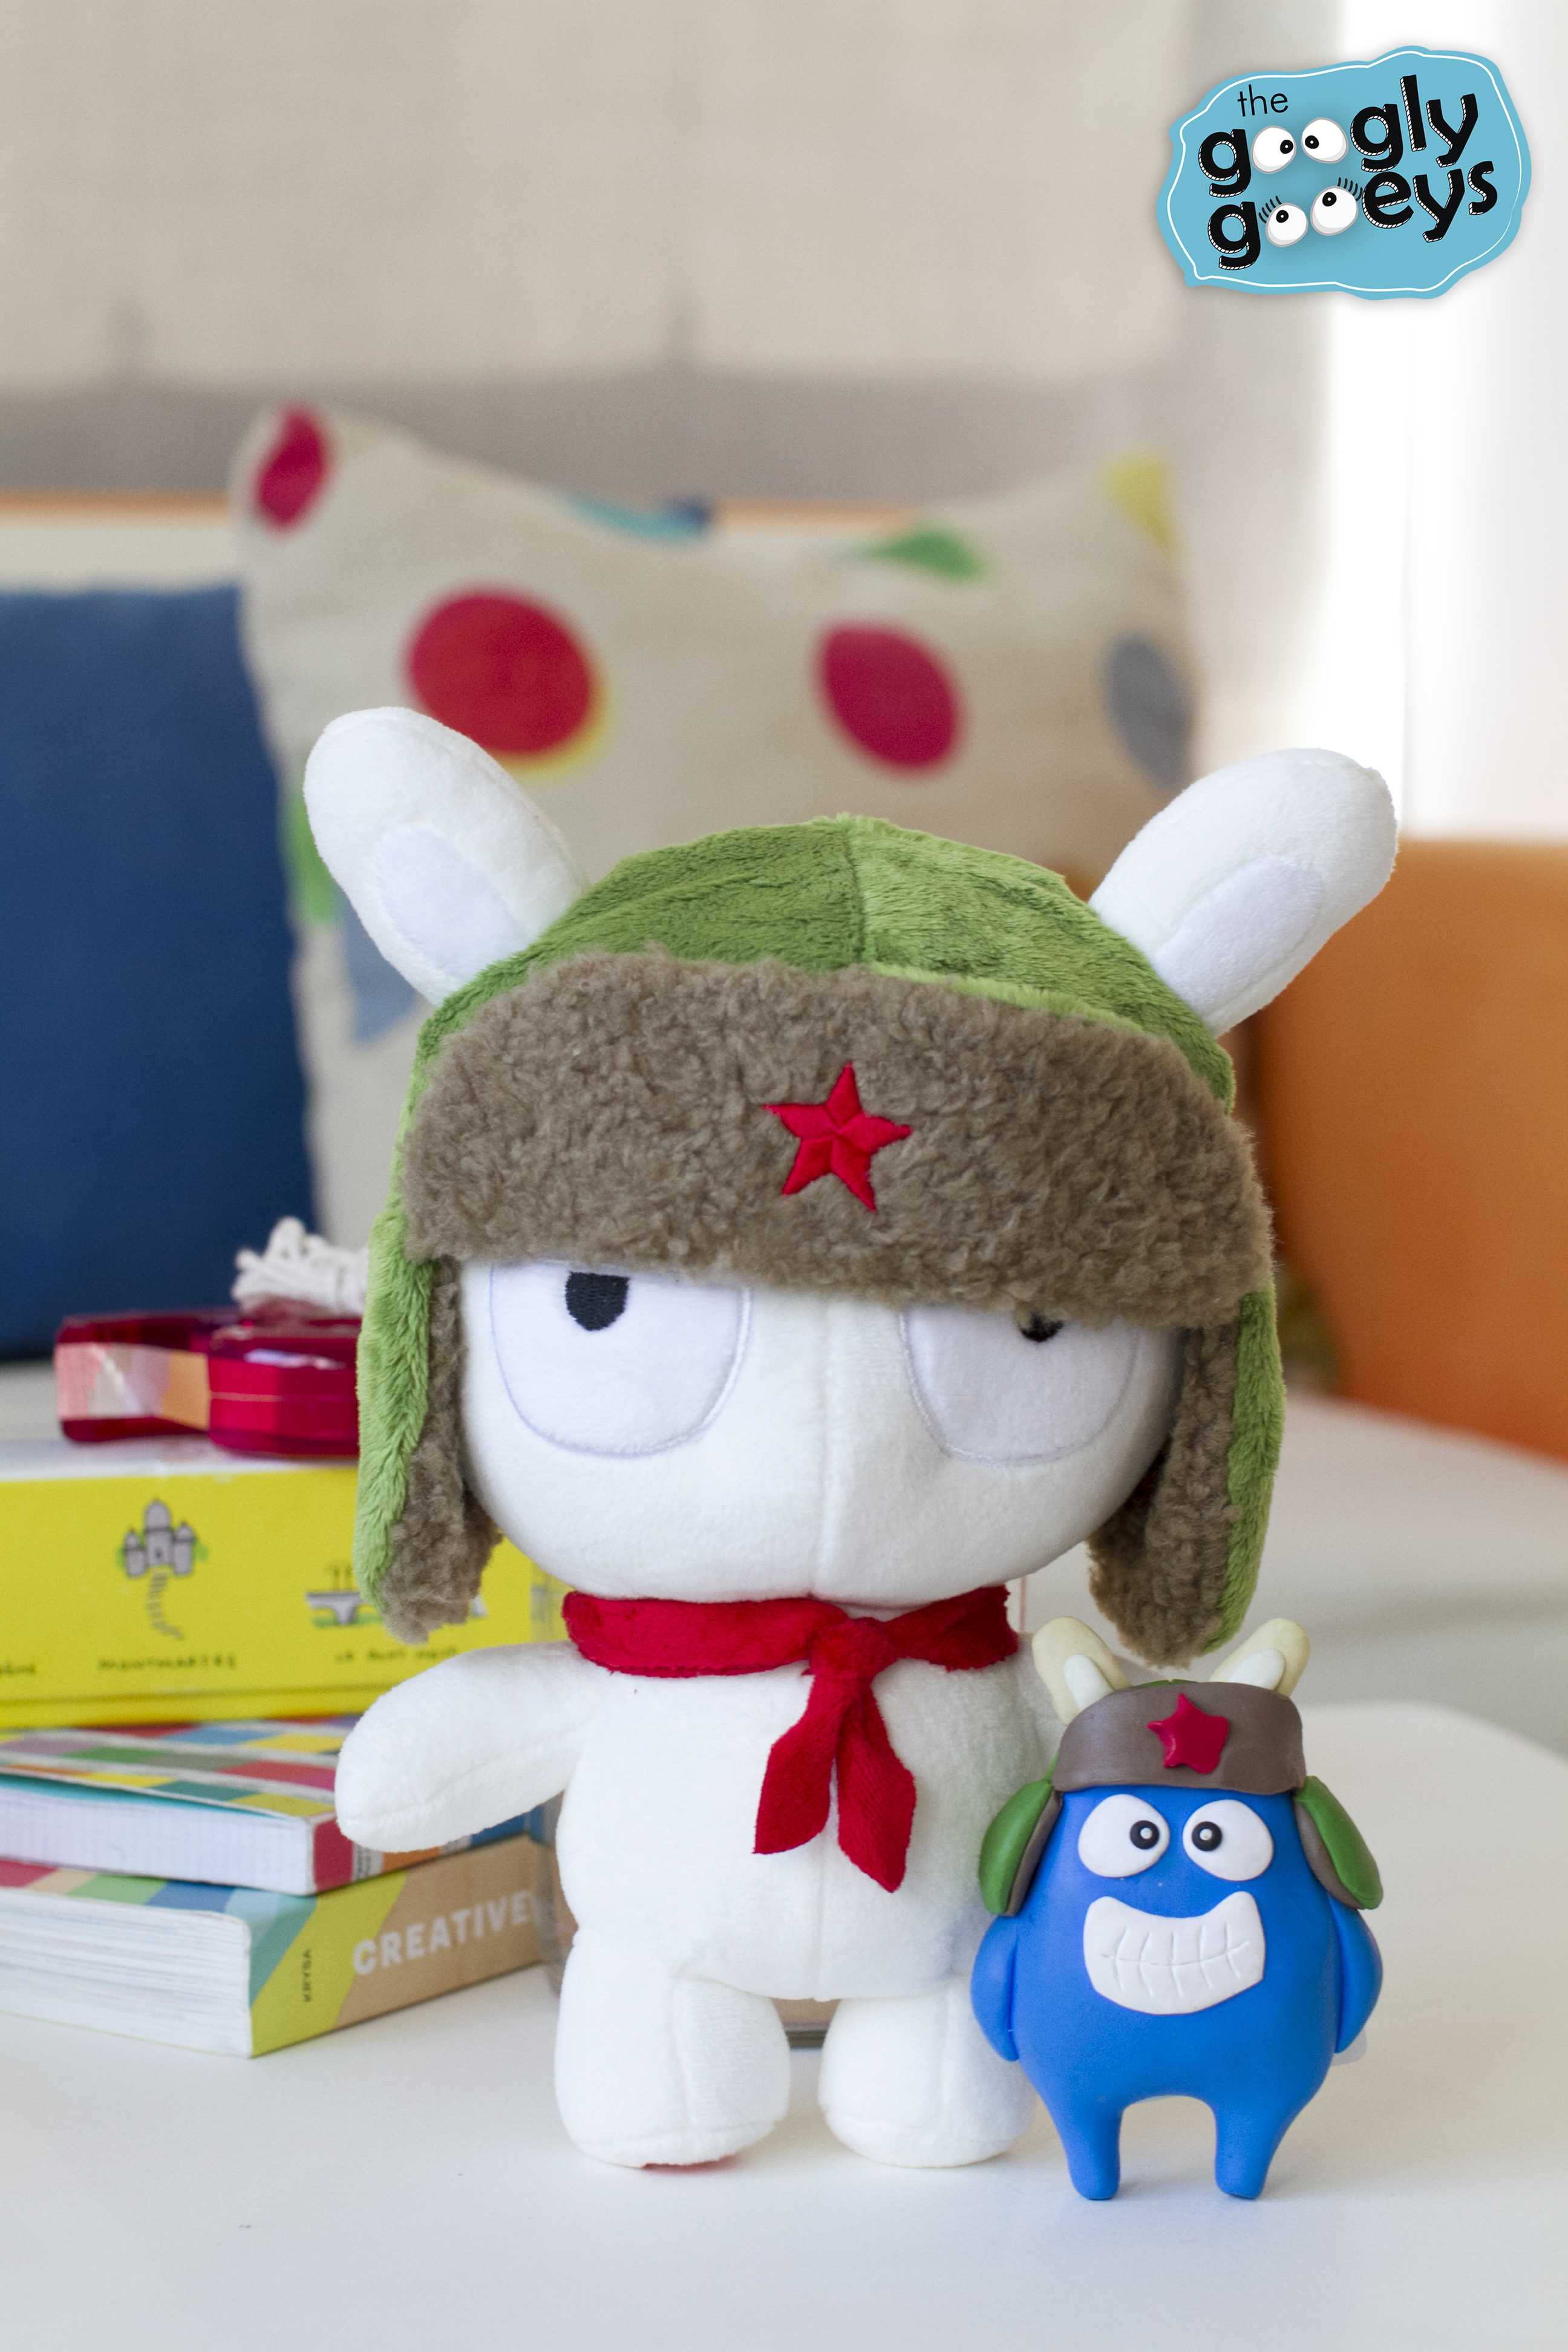 Xiaomi Redmi Phone and Plushie Giveaway